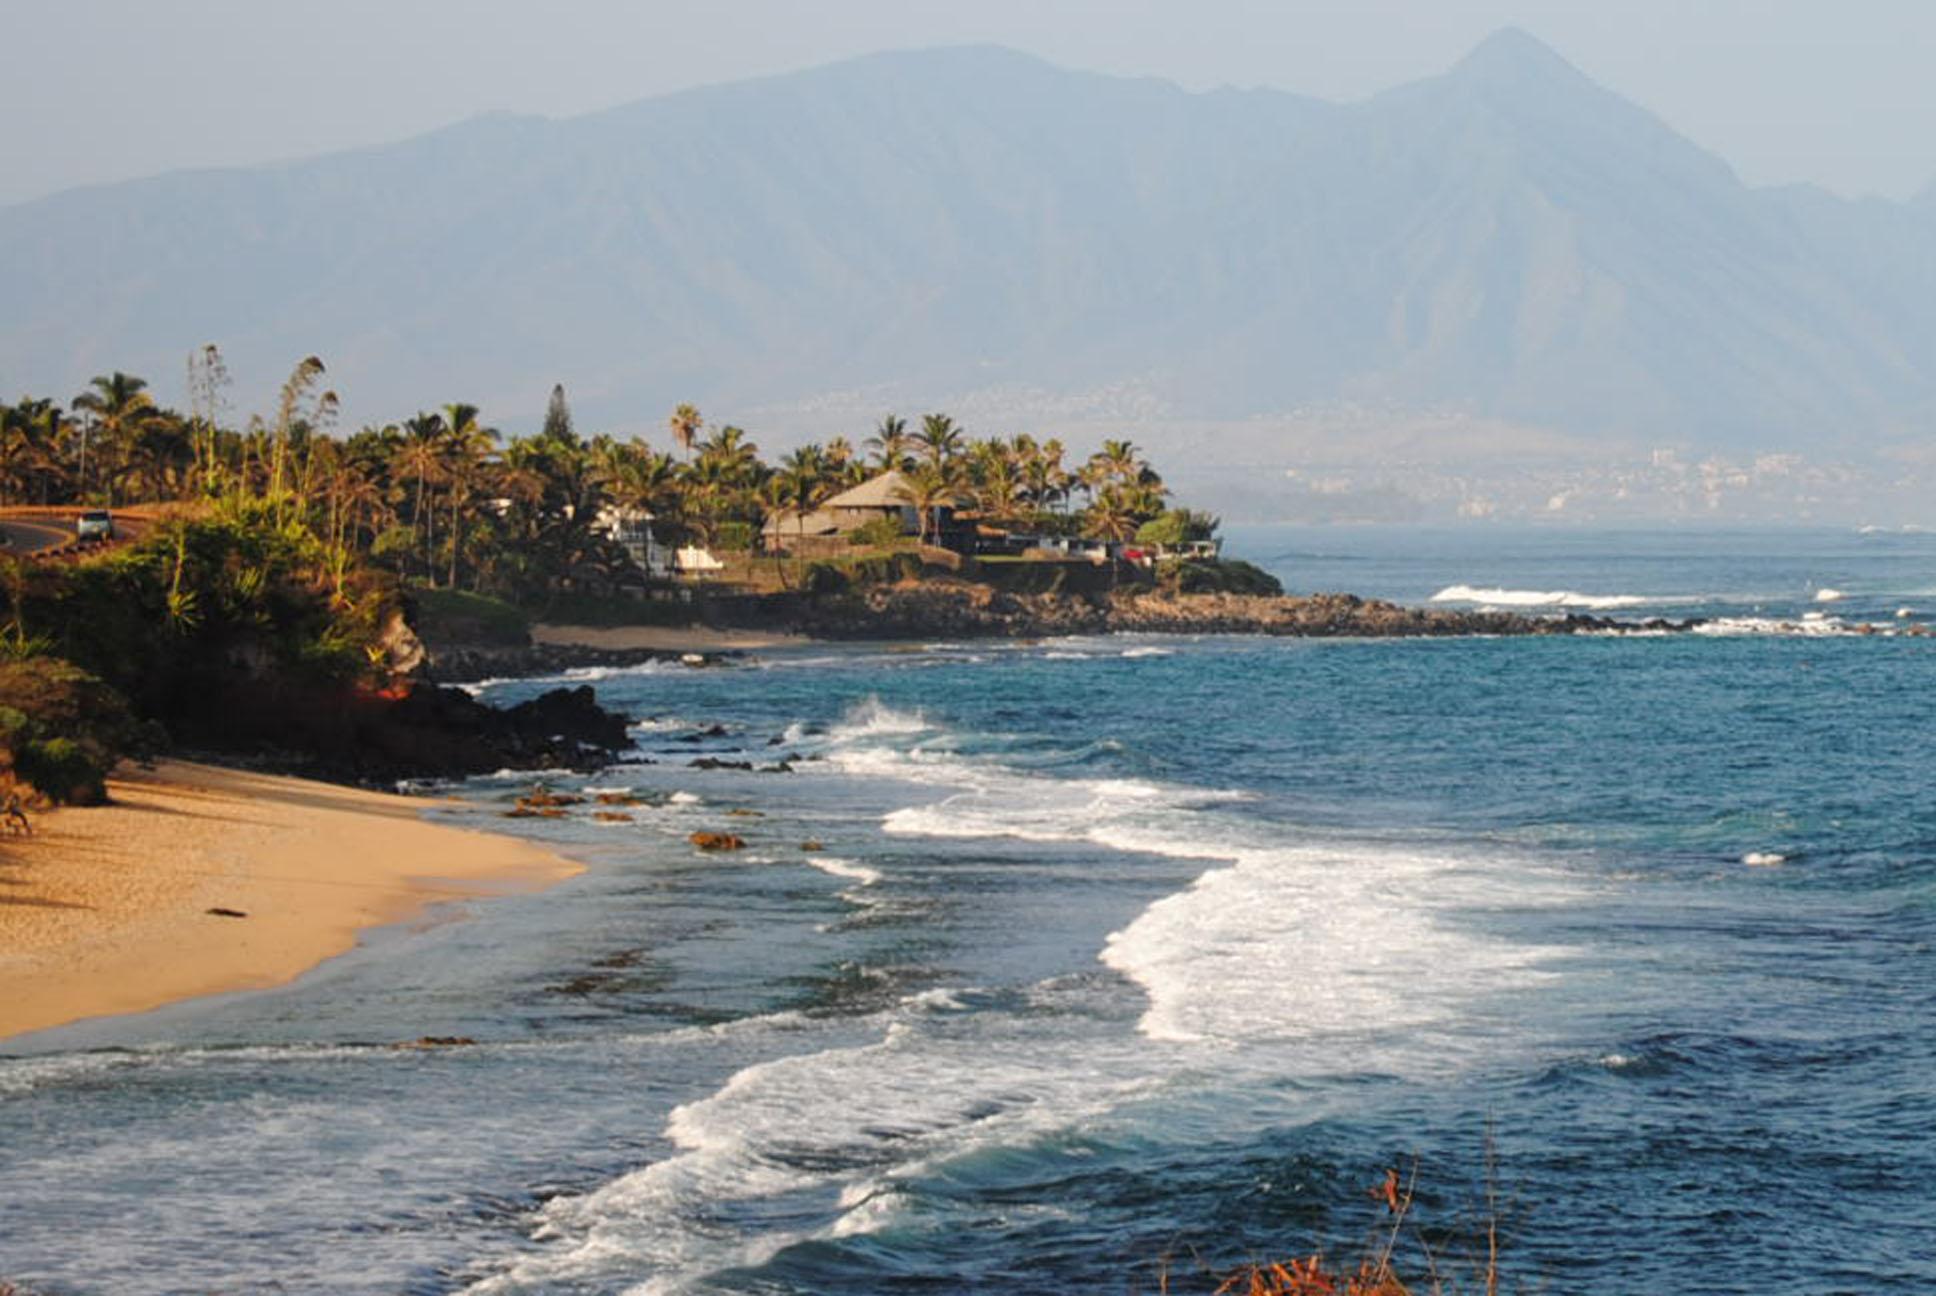 Maui Coastline near Haiku - At the beginning of the Hana Highway